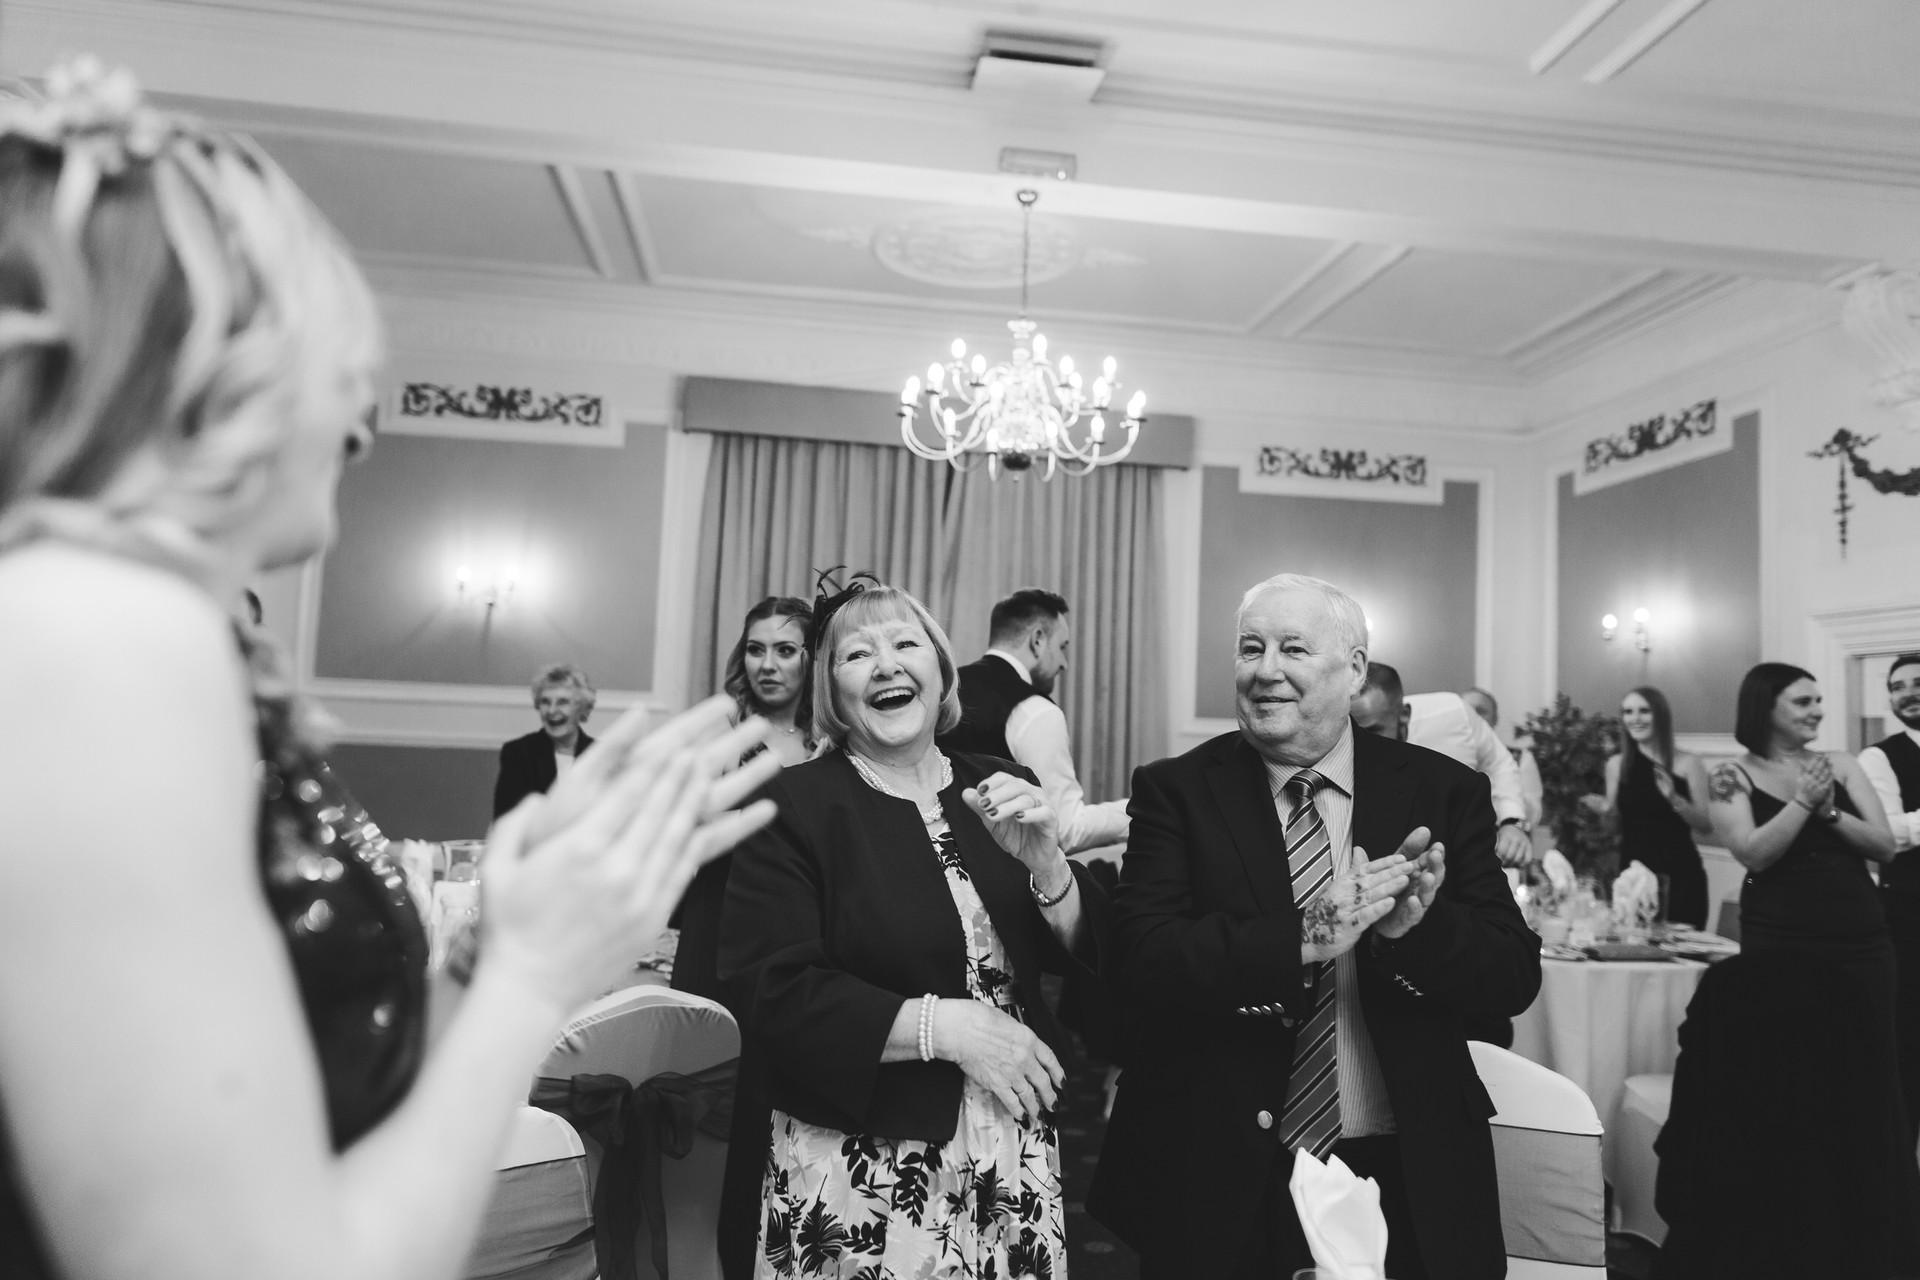 ilkley-west-yorkshire-wedding-149.jpg